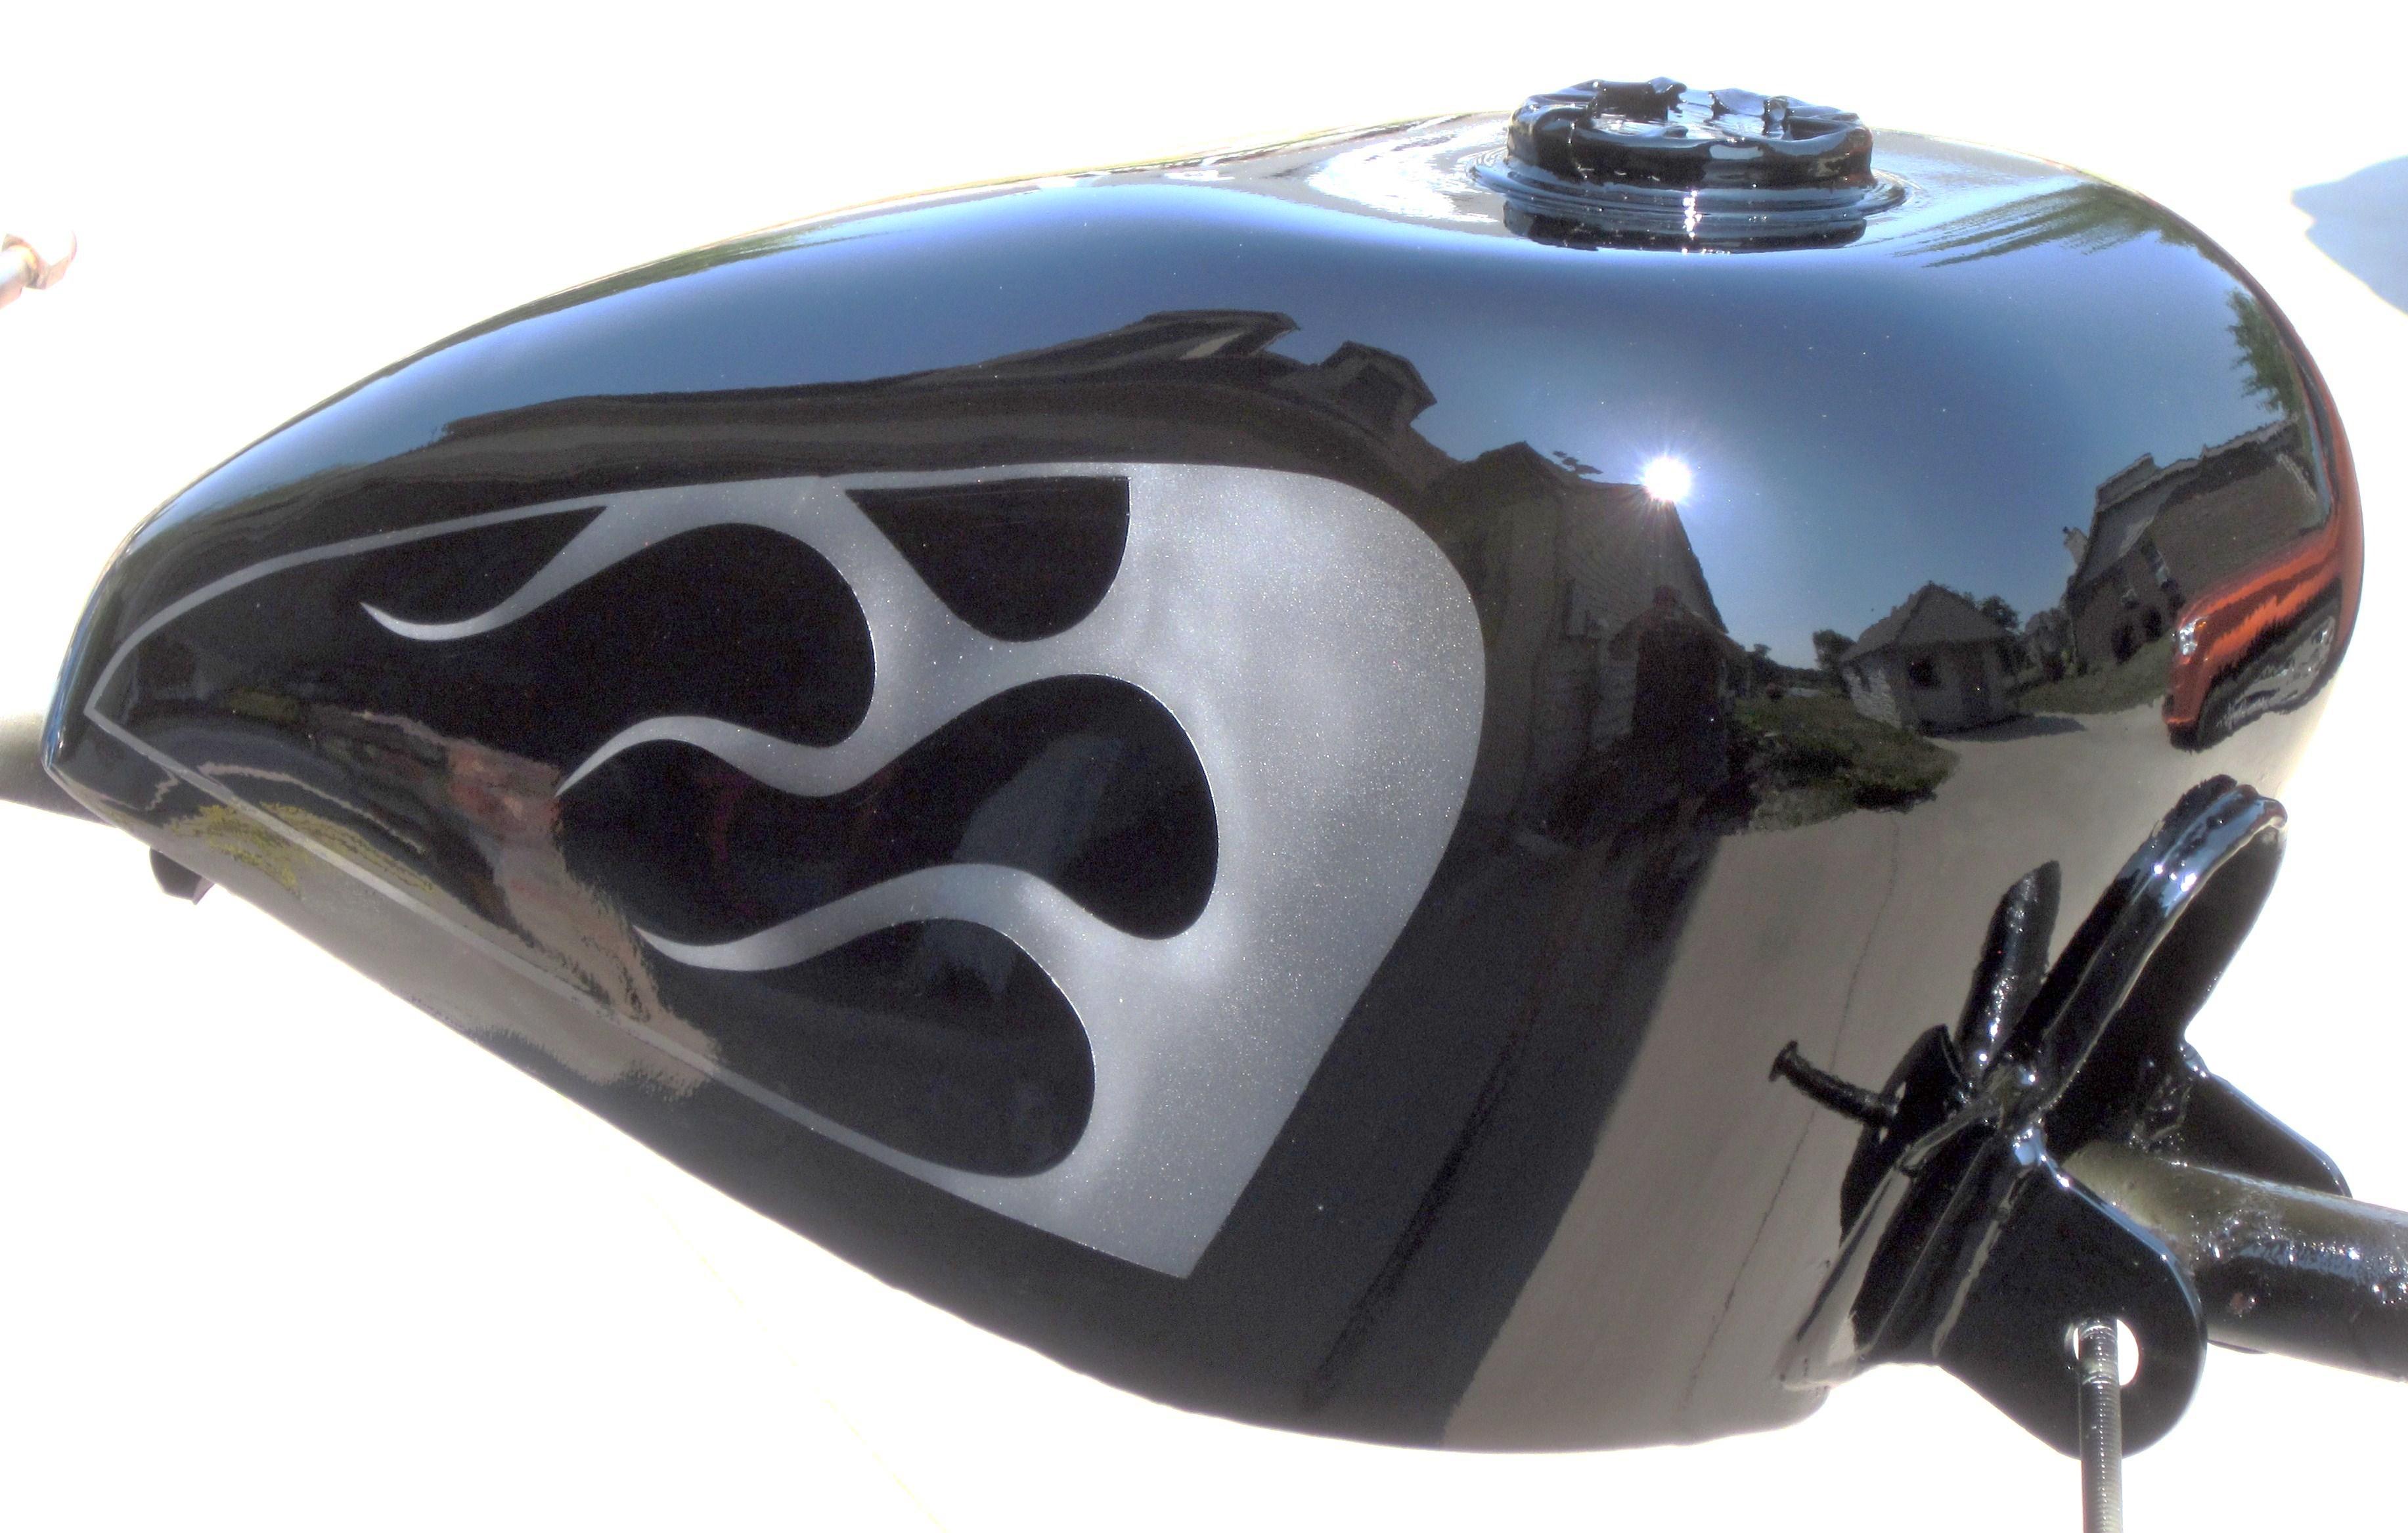 Click image for larger version  Name:bike, tank, paint gun 015.JPG Views:112 Size:1.05 MB ID:66202